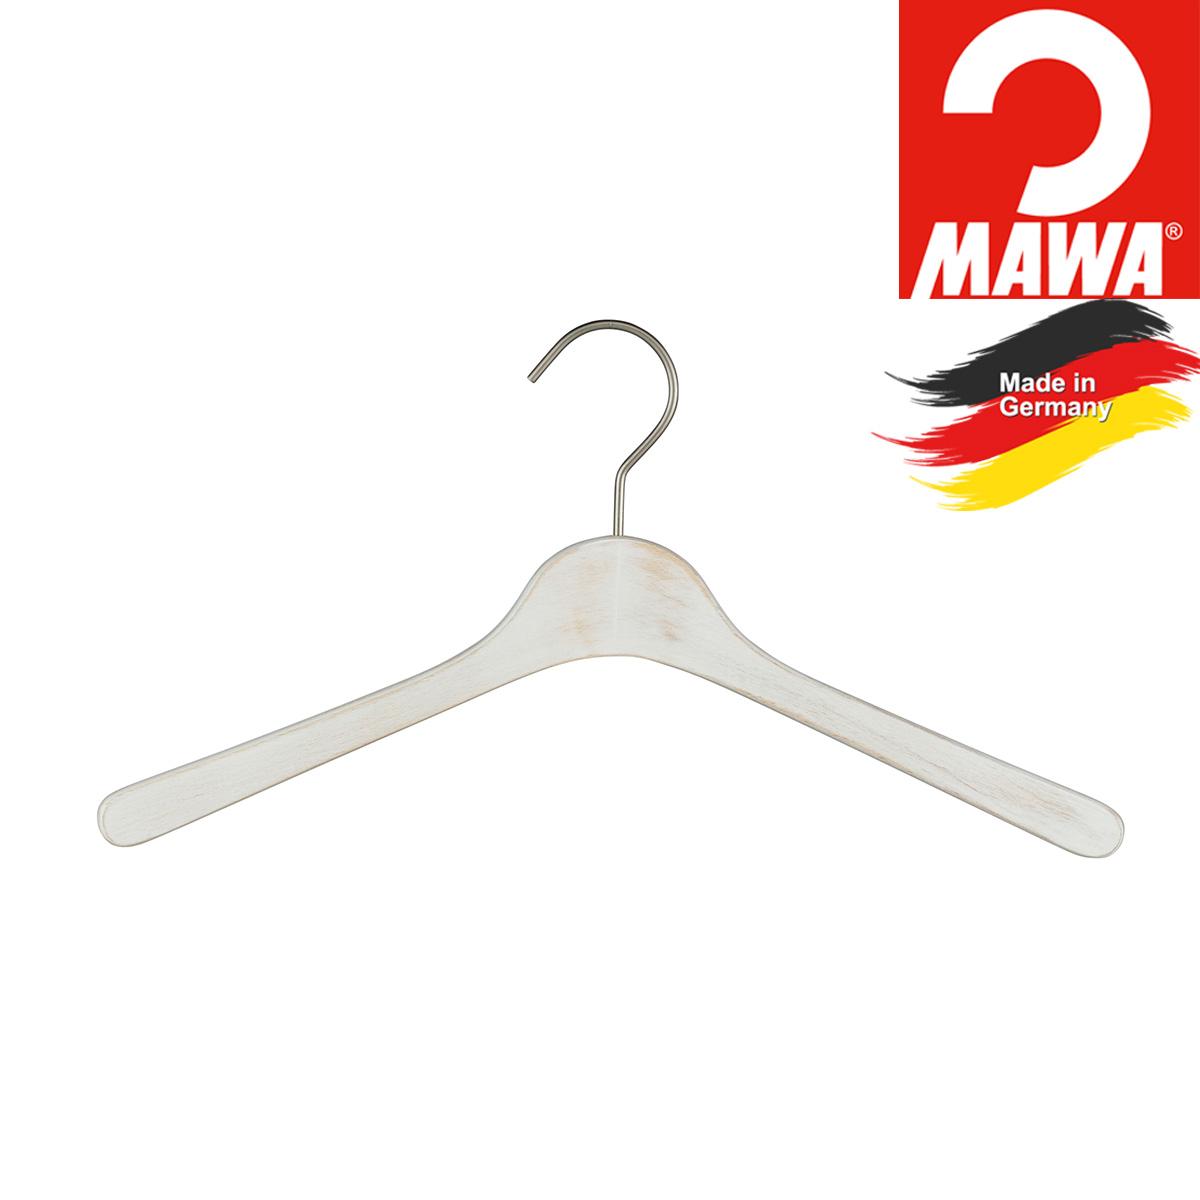 MAWA Oberteilkleiderbügel